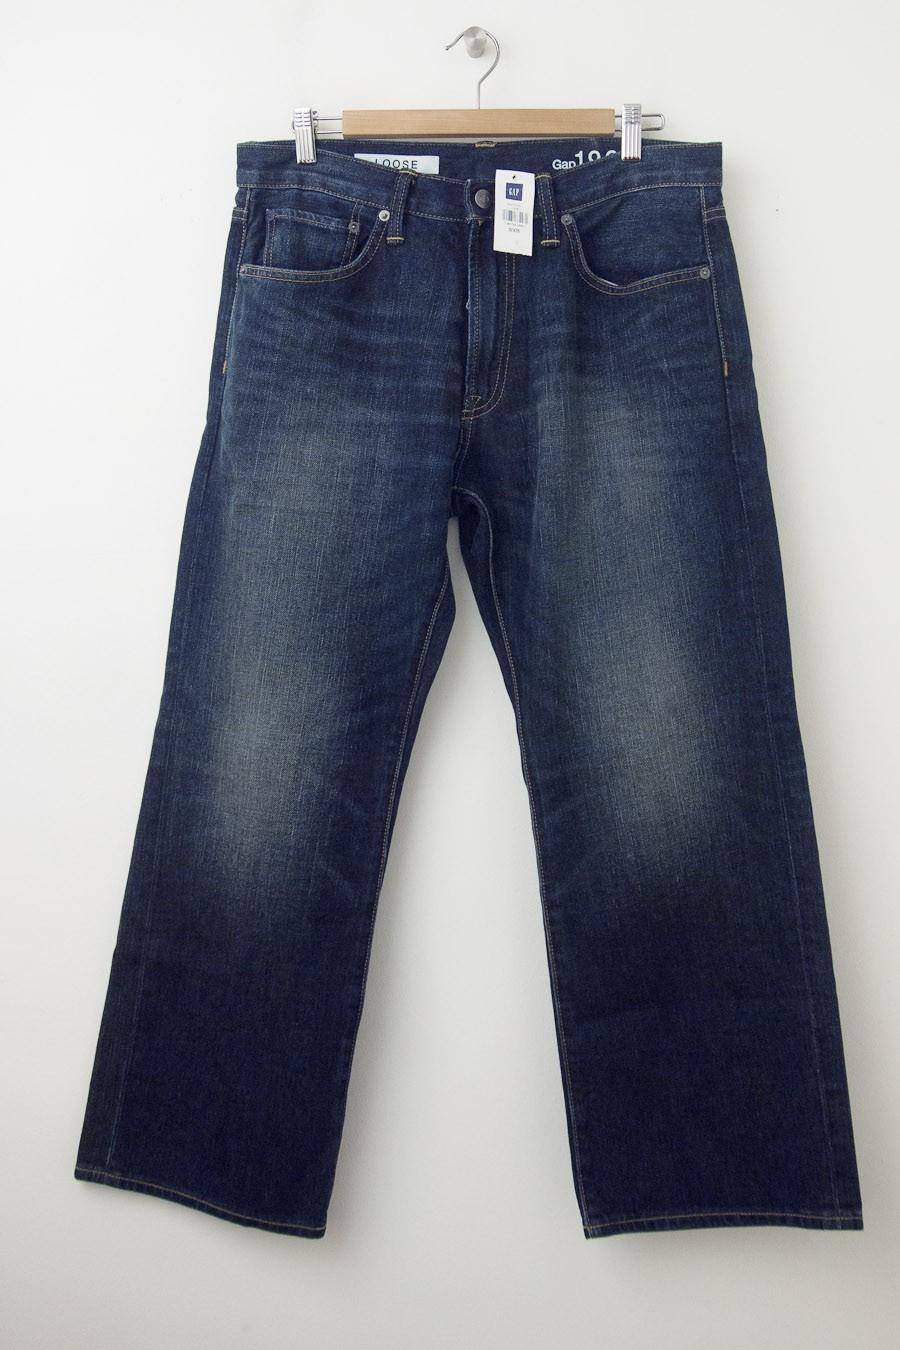 Loose Fit Women S Jeans